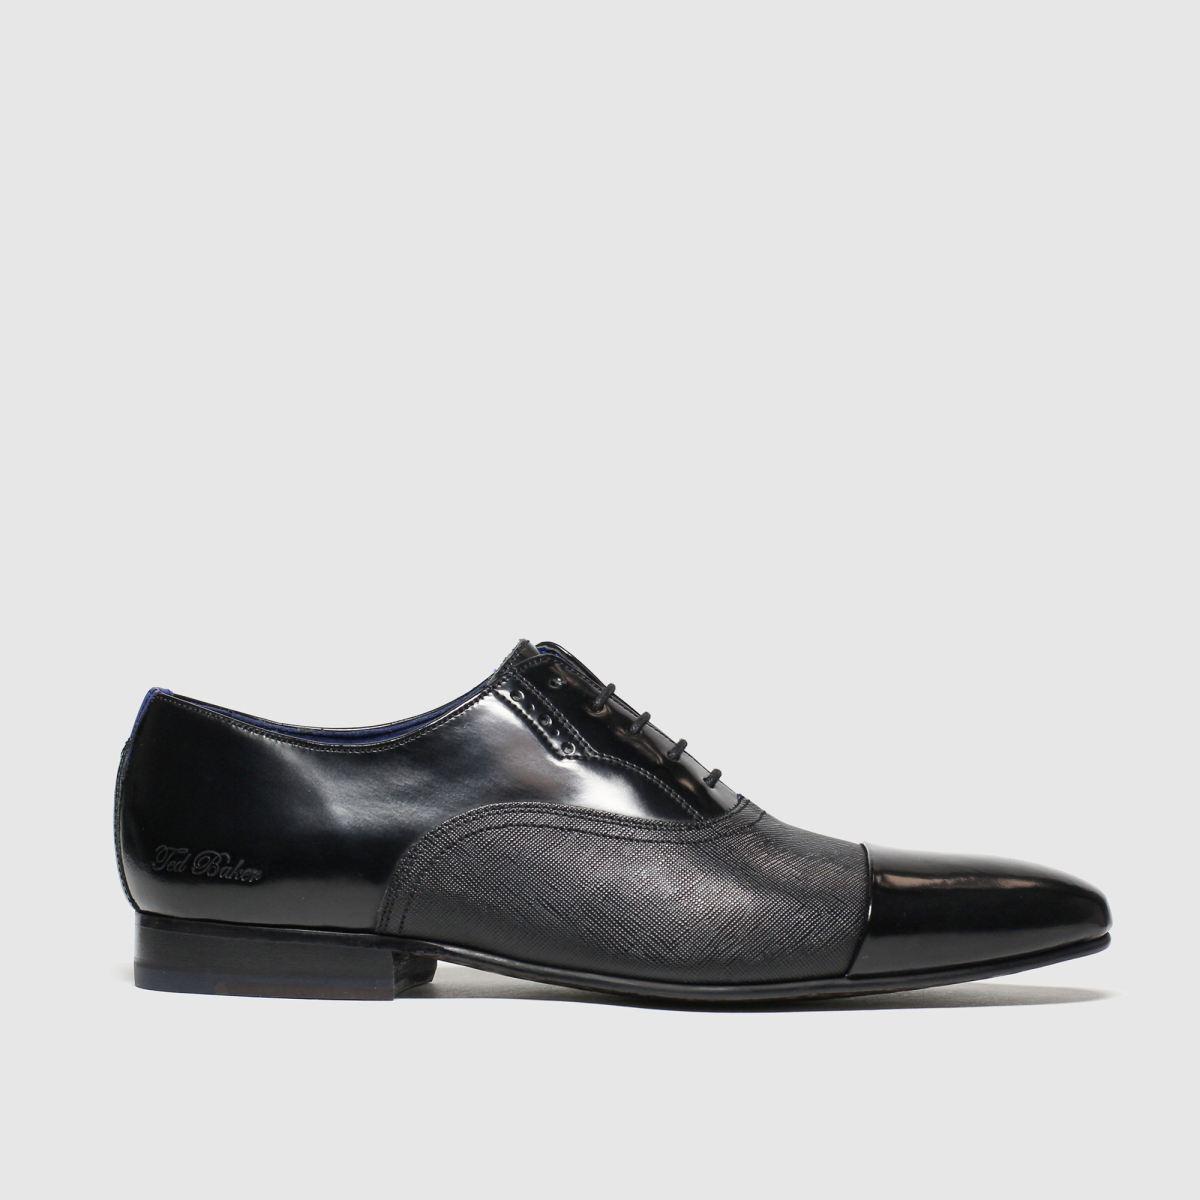 Ted Baker Black Muraa Shoes